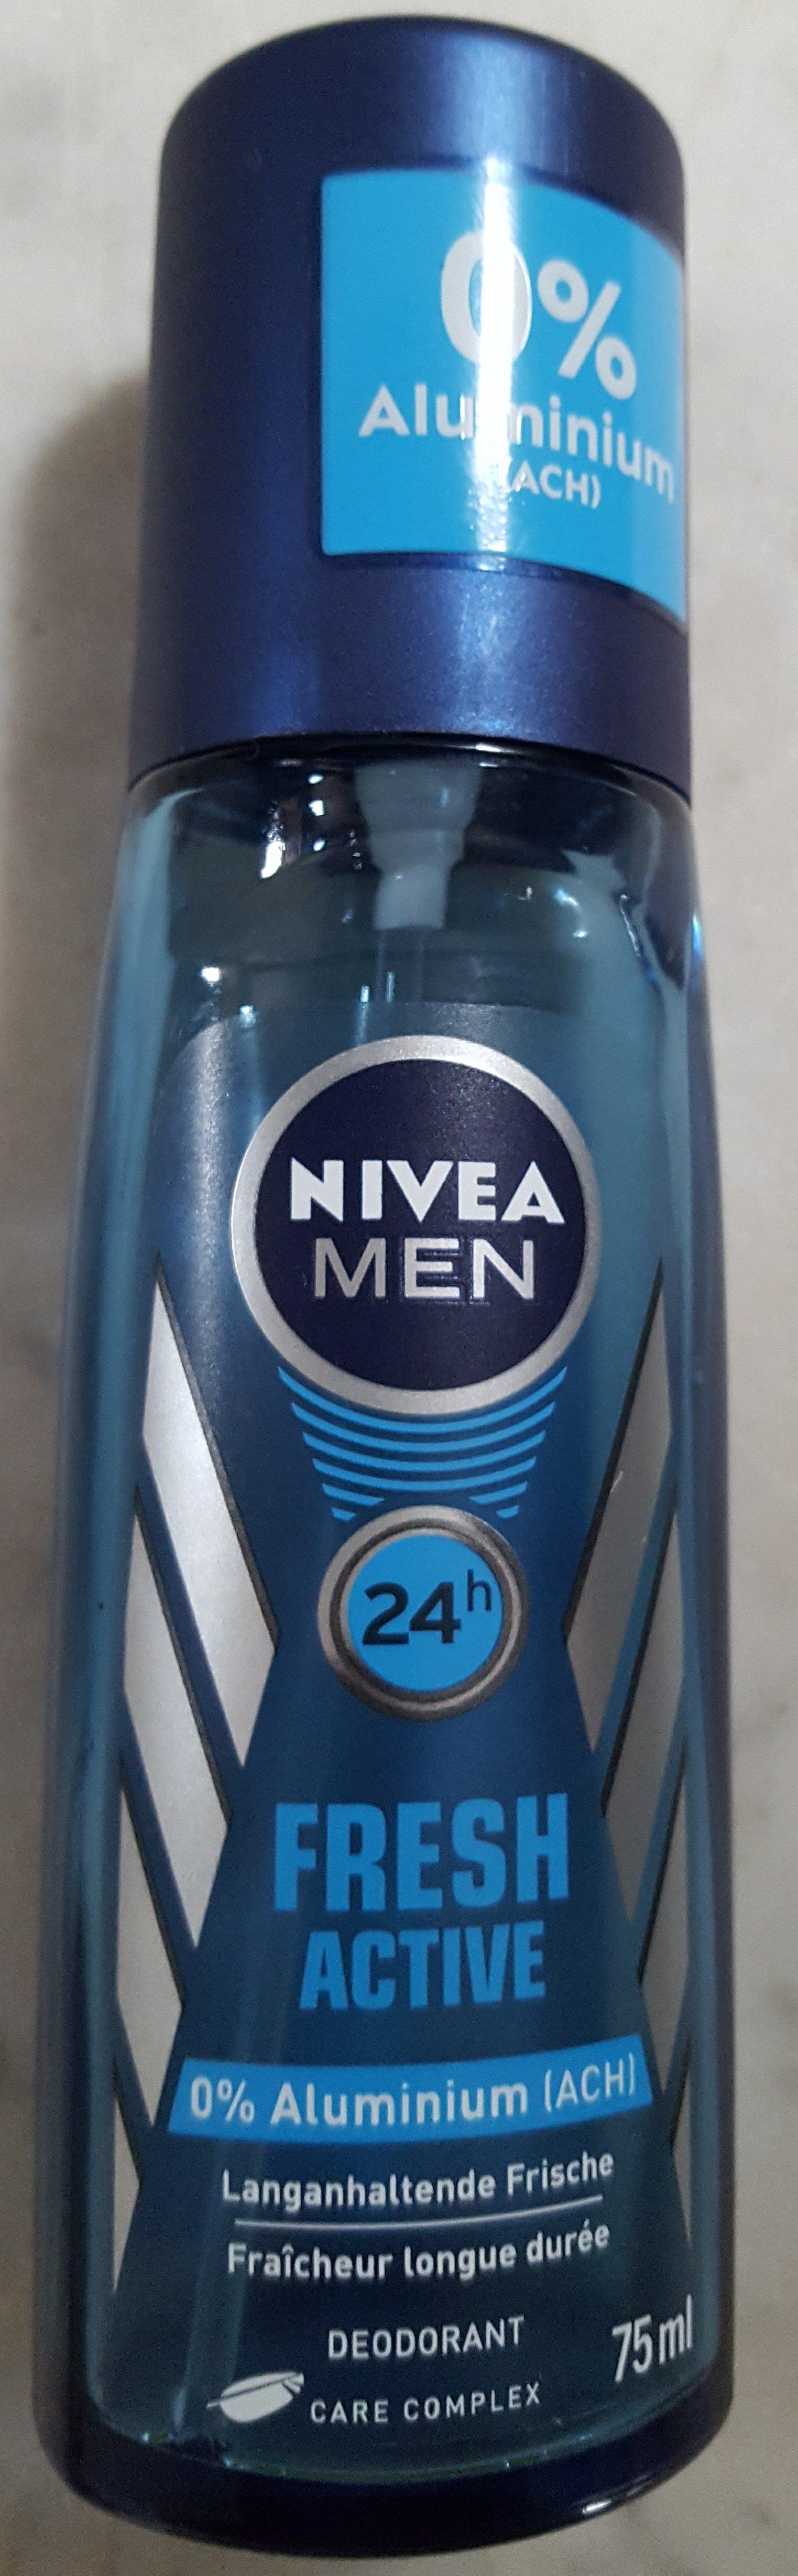 Nivea Men Fresh Active 24h - Product